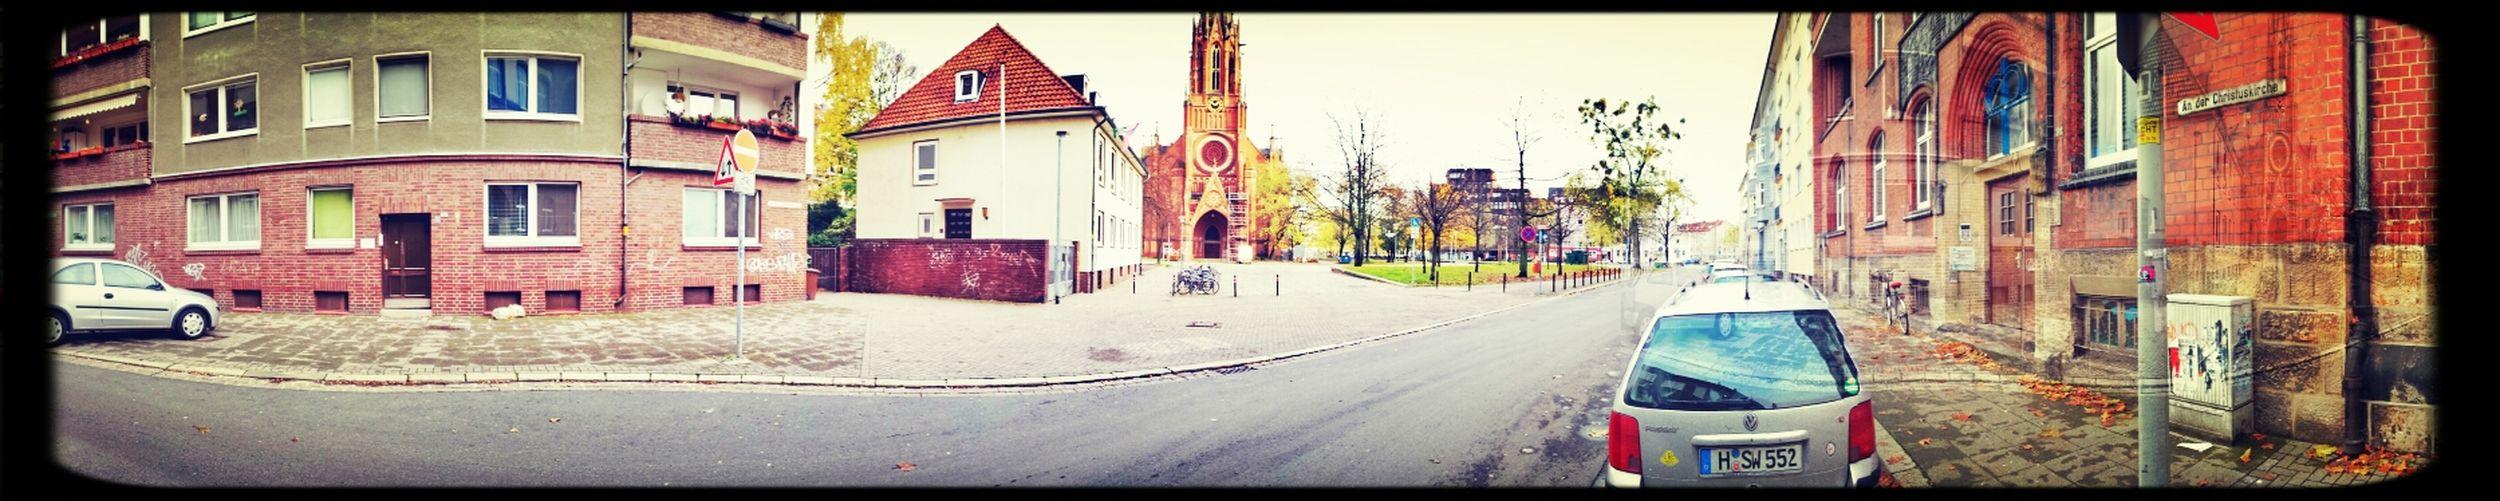 Church Hannover Germany